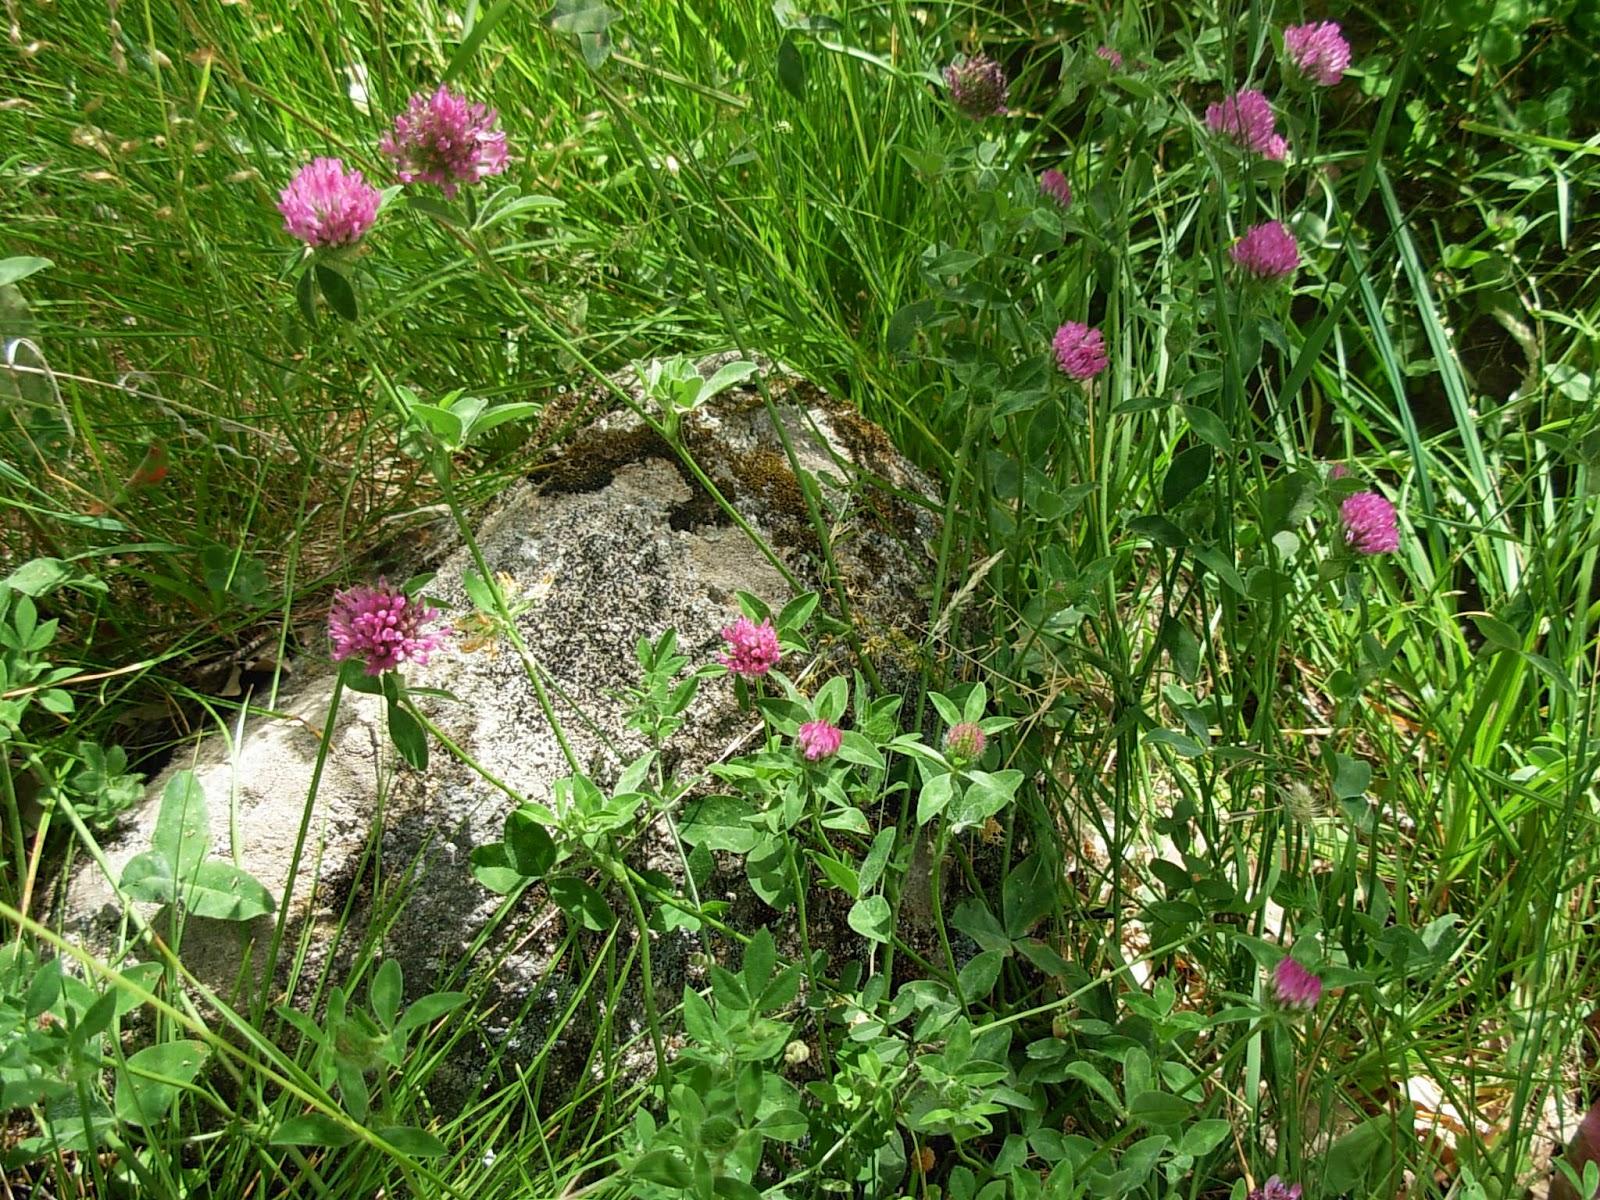 Plazuelanavaluenga: Trébol rojo o violeta (Trifolium pratense)